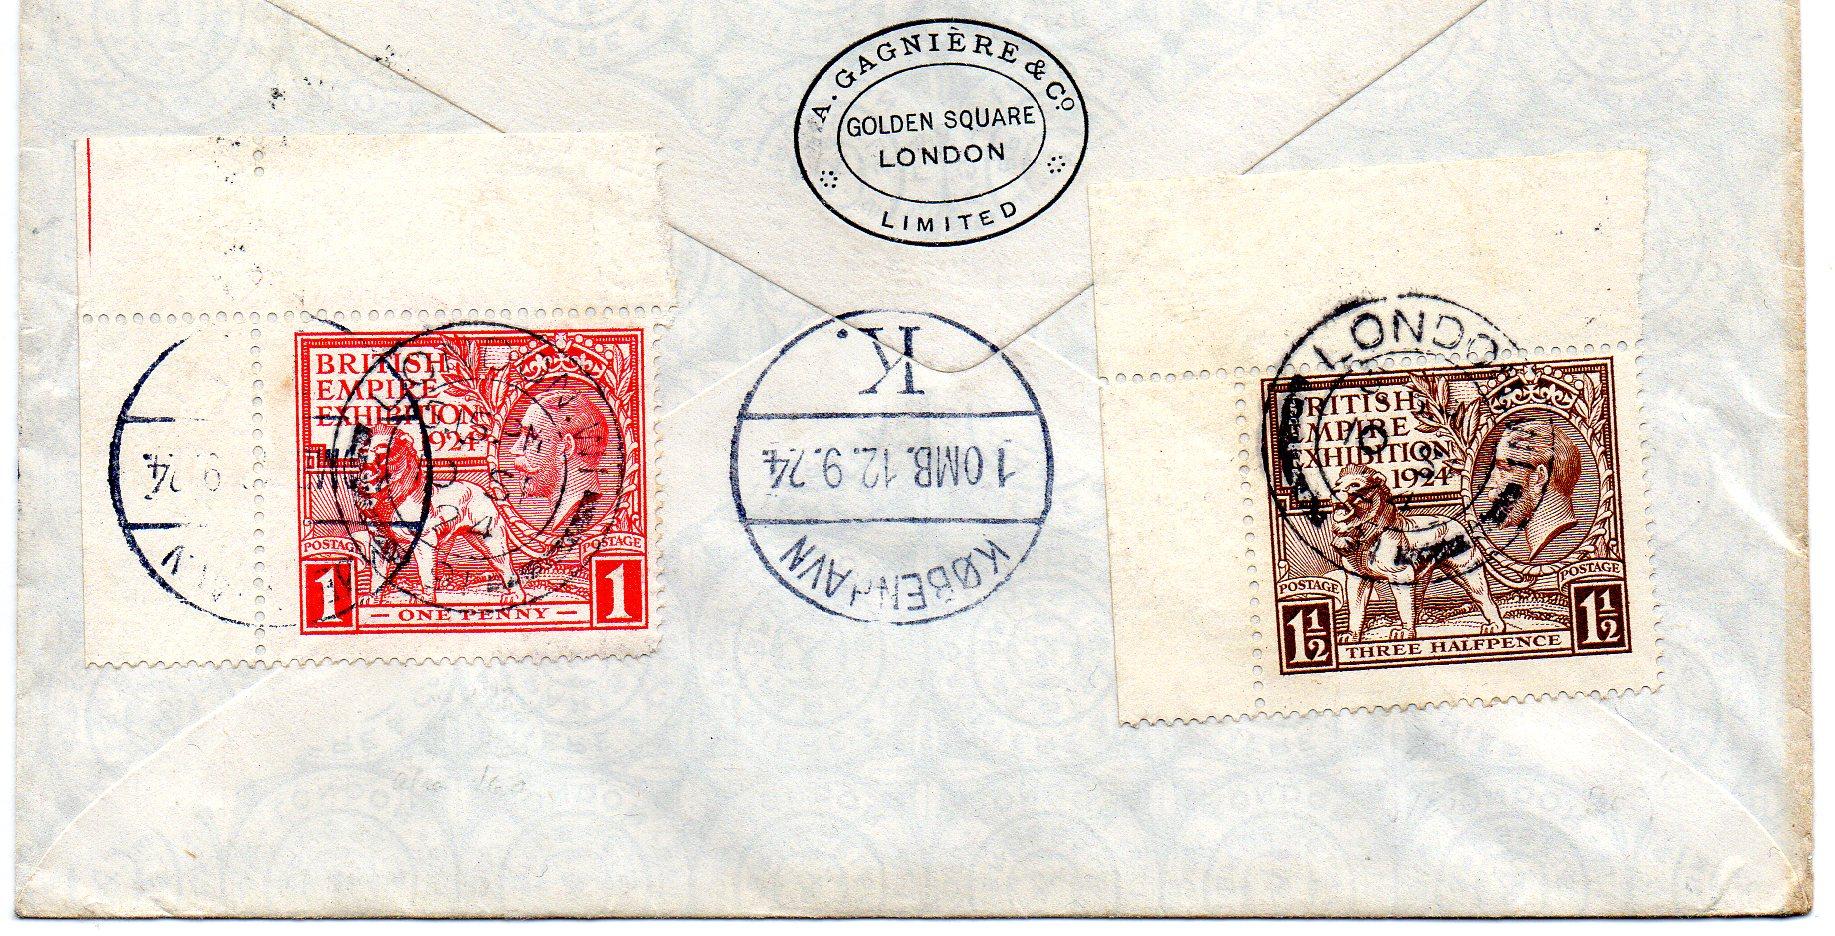 1924 Wemley